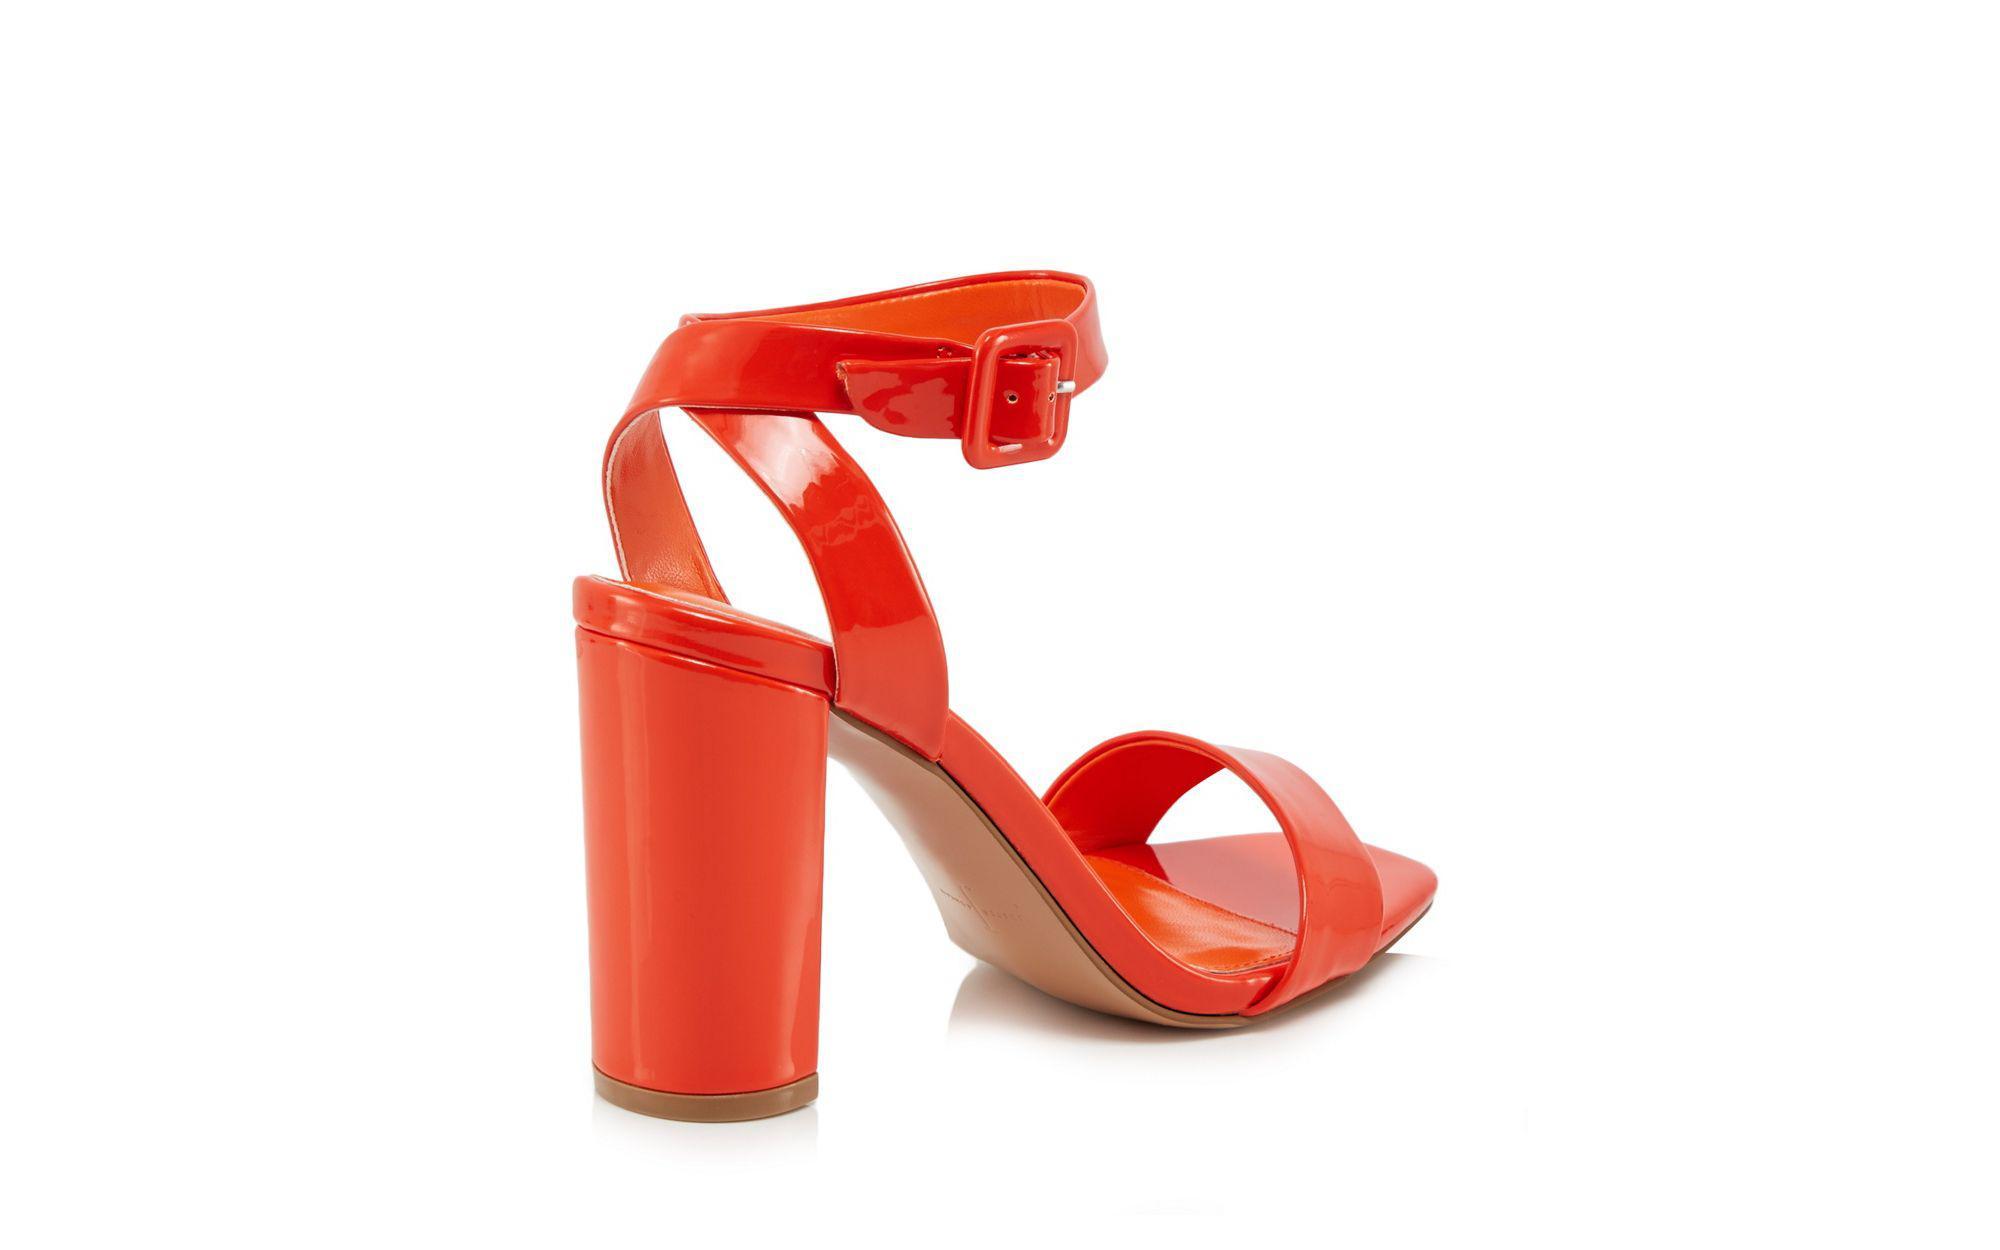 08802b17f3dece J By Jasper Conran Orange Patent  jessica  High Block Heel Ankle ...